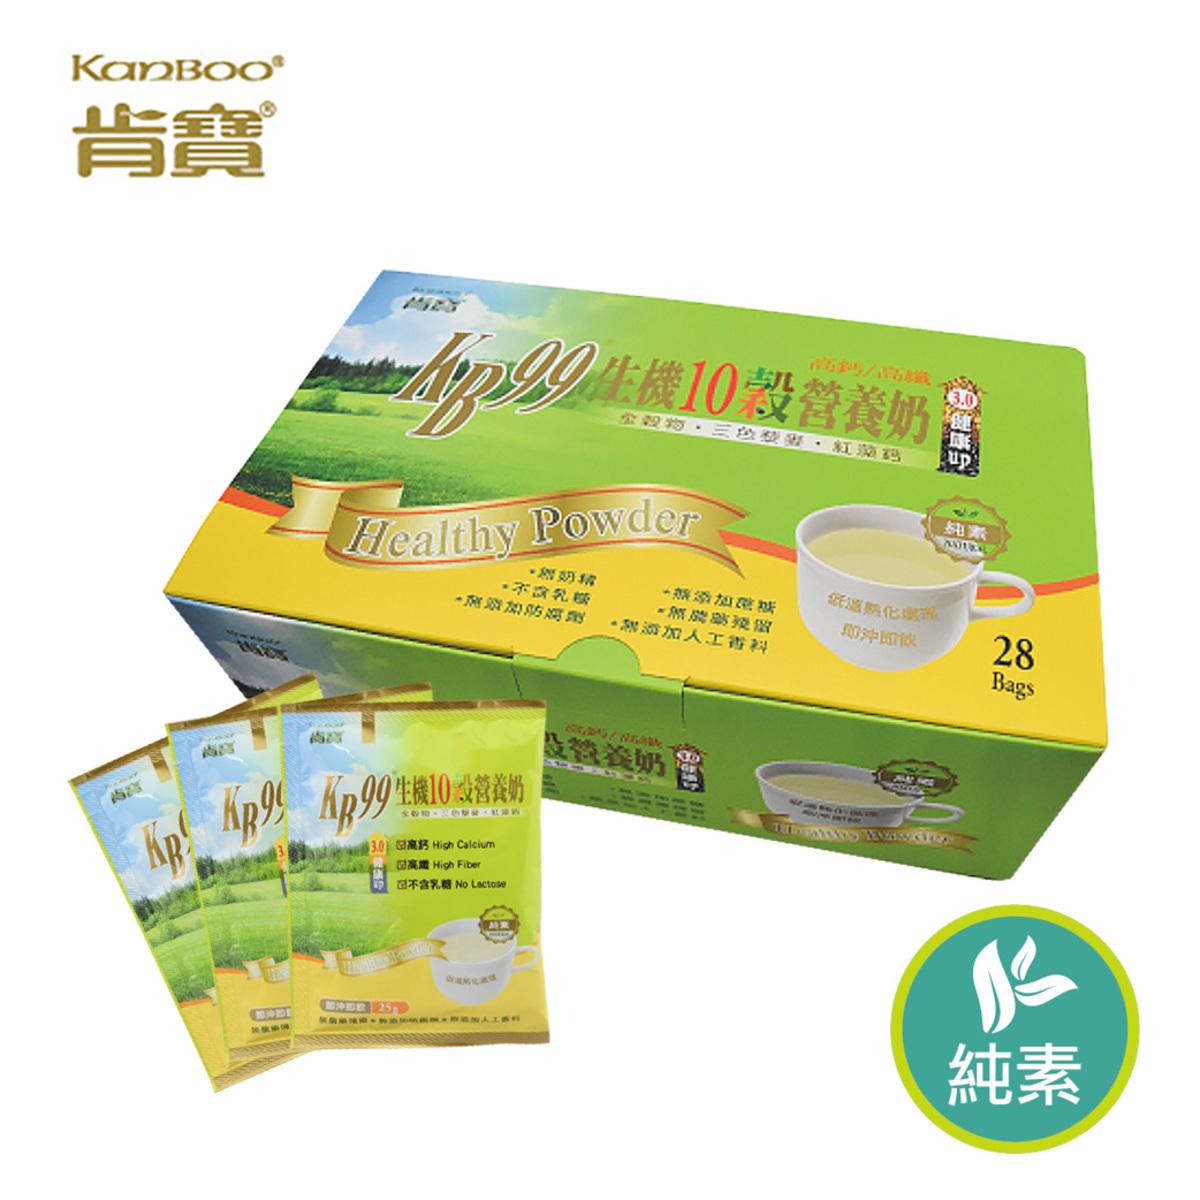 KB99 10 Grains Powder Instant Drink 25g x 28